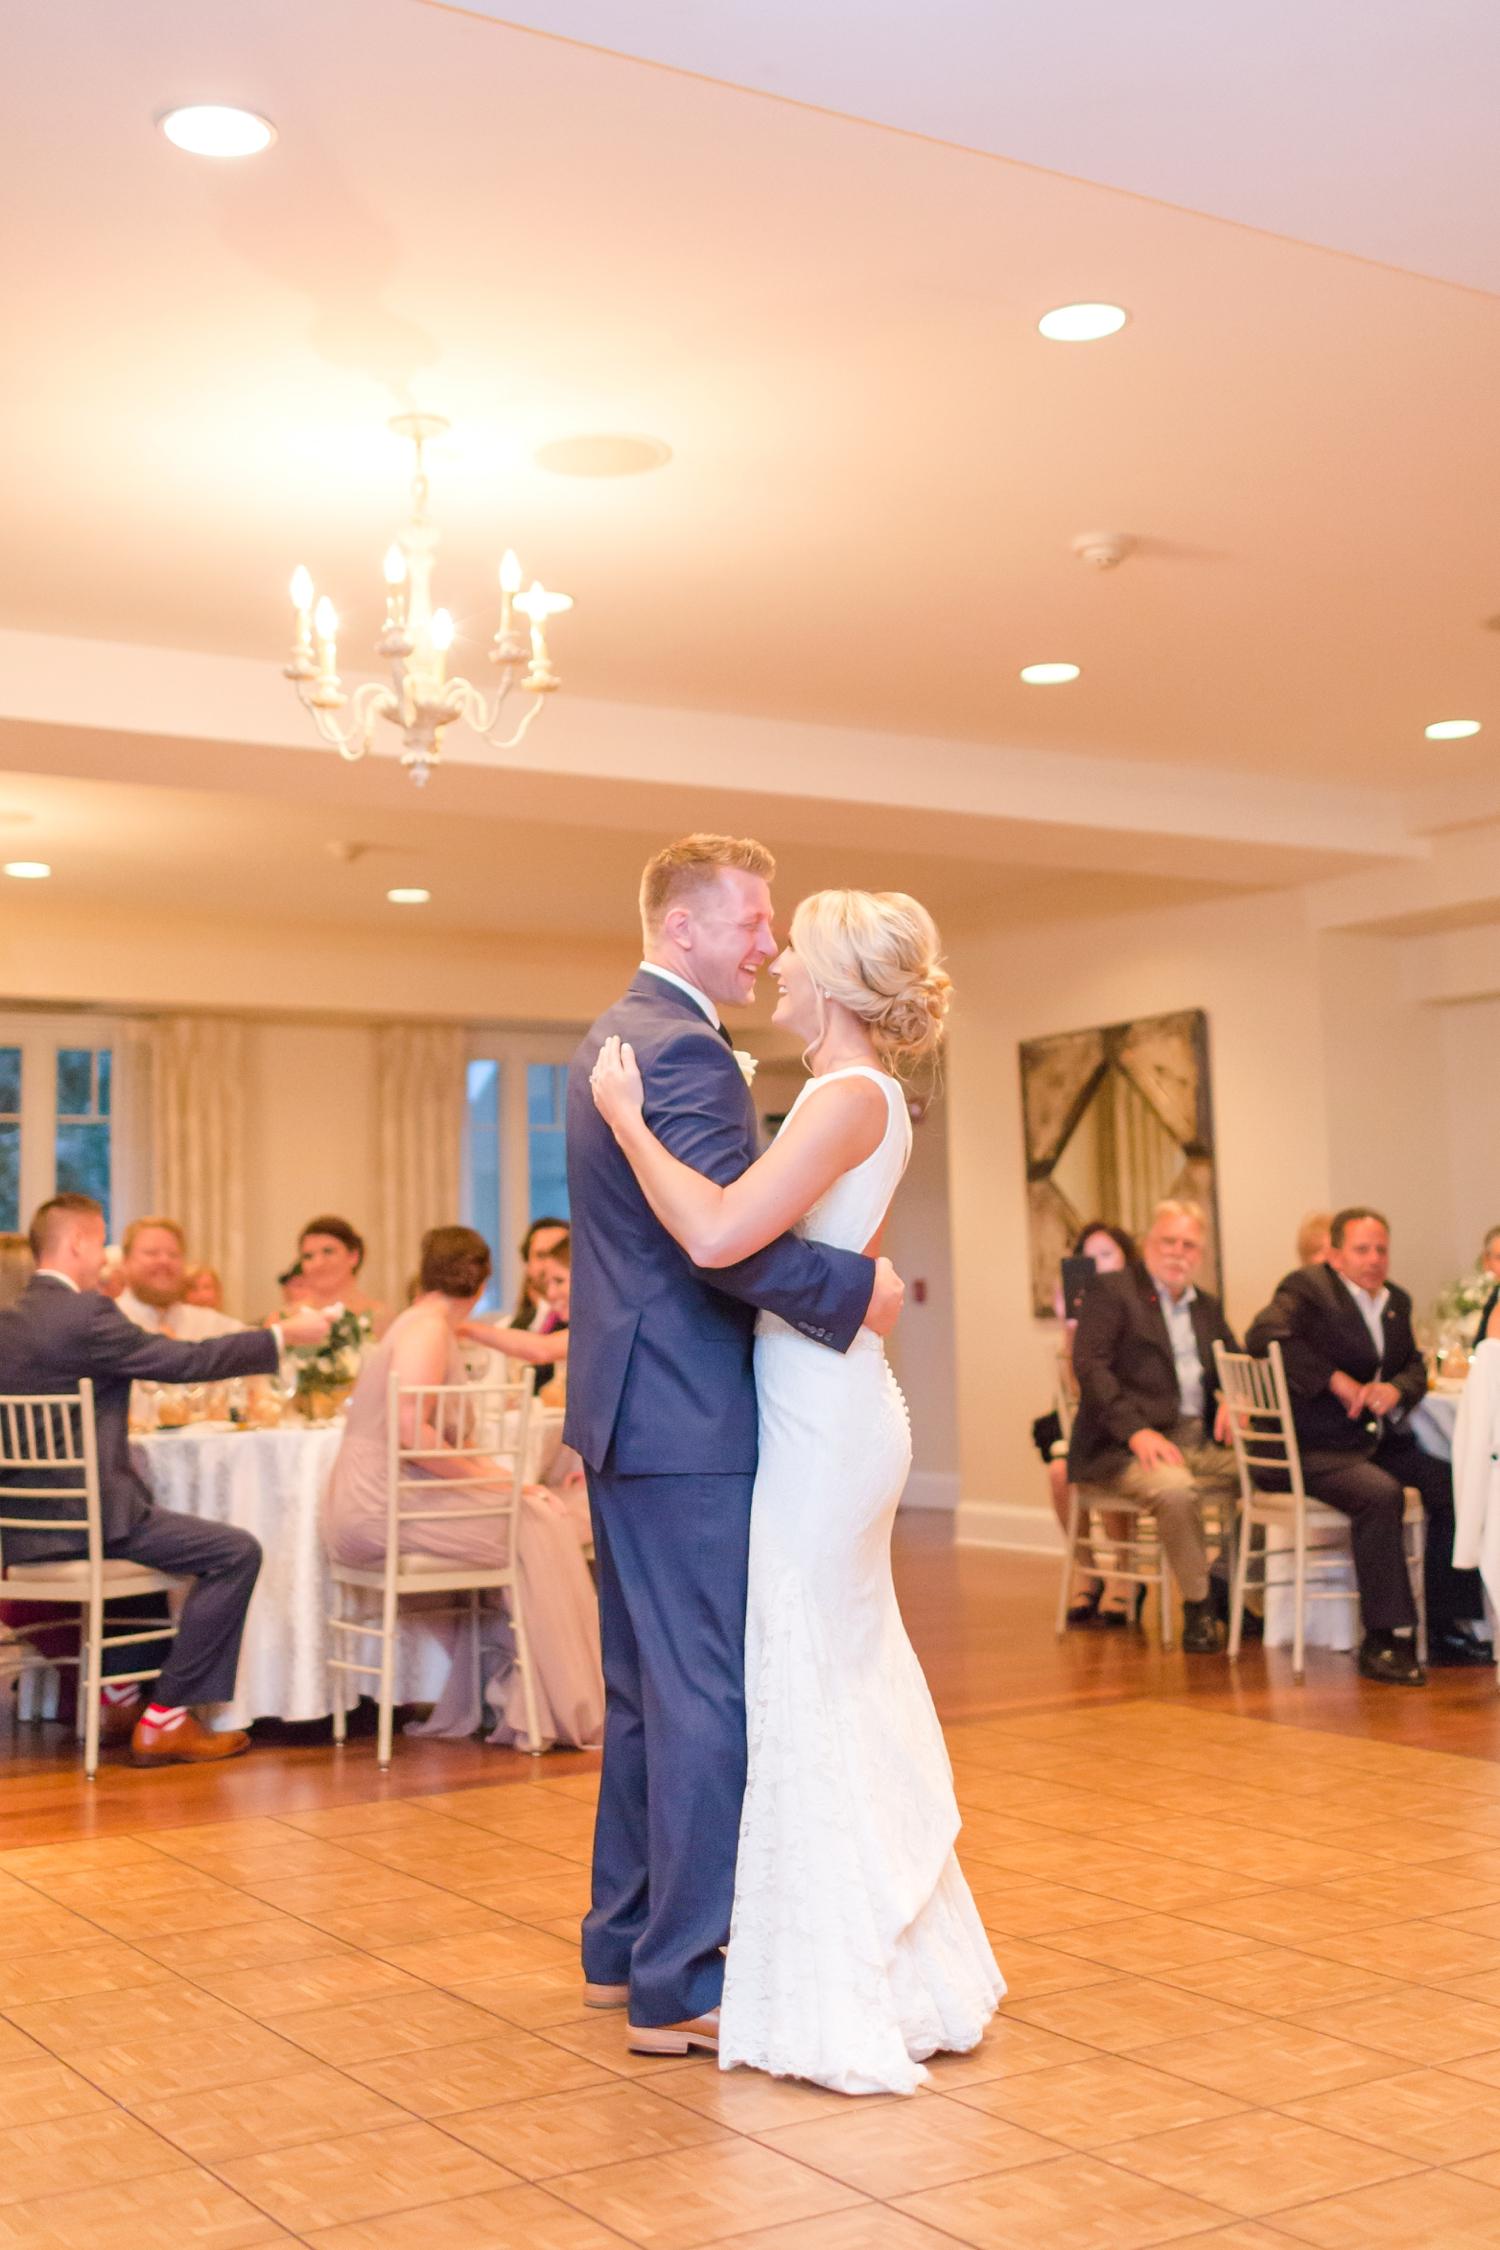 Wojciechowski Wedding-448_the-oaks-waterfront-inn-wedding-easton-maryland-wedding-photography-anna-grace-photography-photo.jpg